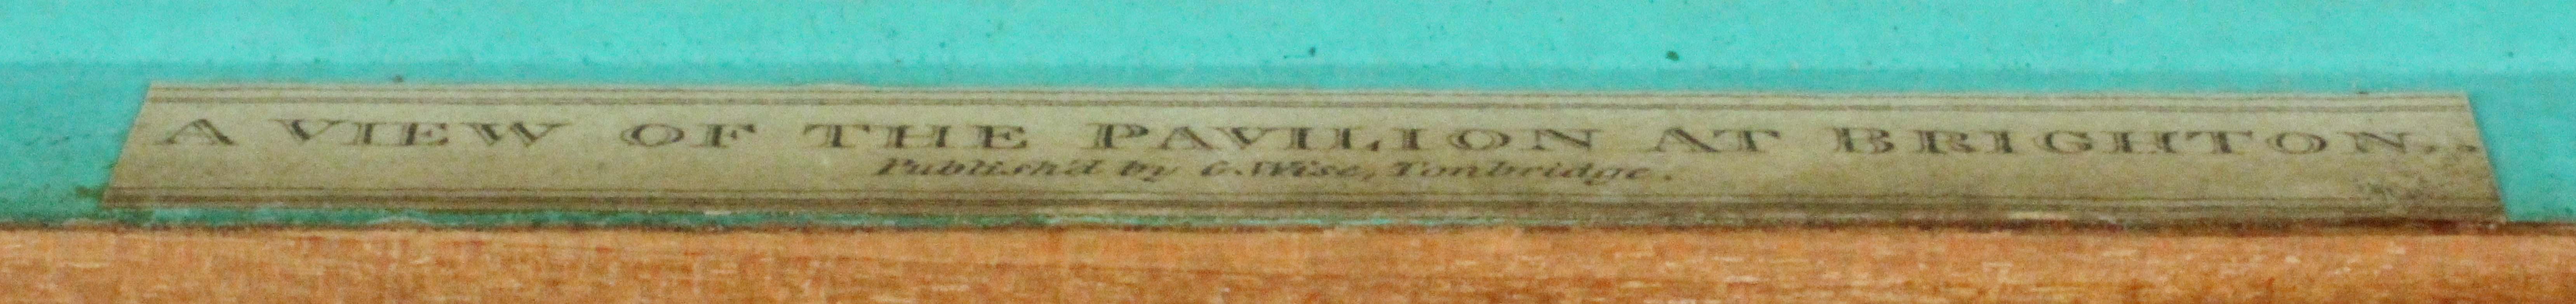 A rare Tunbridge ware mahogany writing box, the lid with an inset mosaic panel of Tunbridge Castle - Image 4 of 4